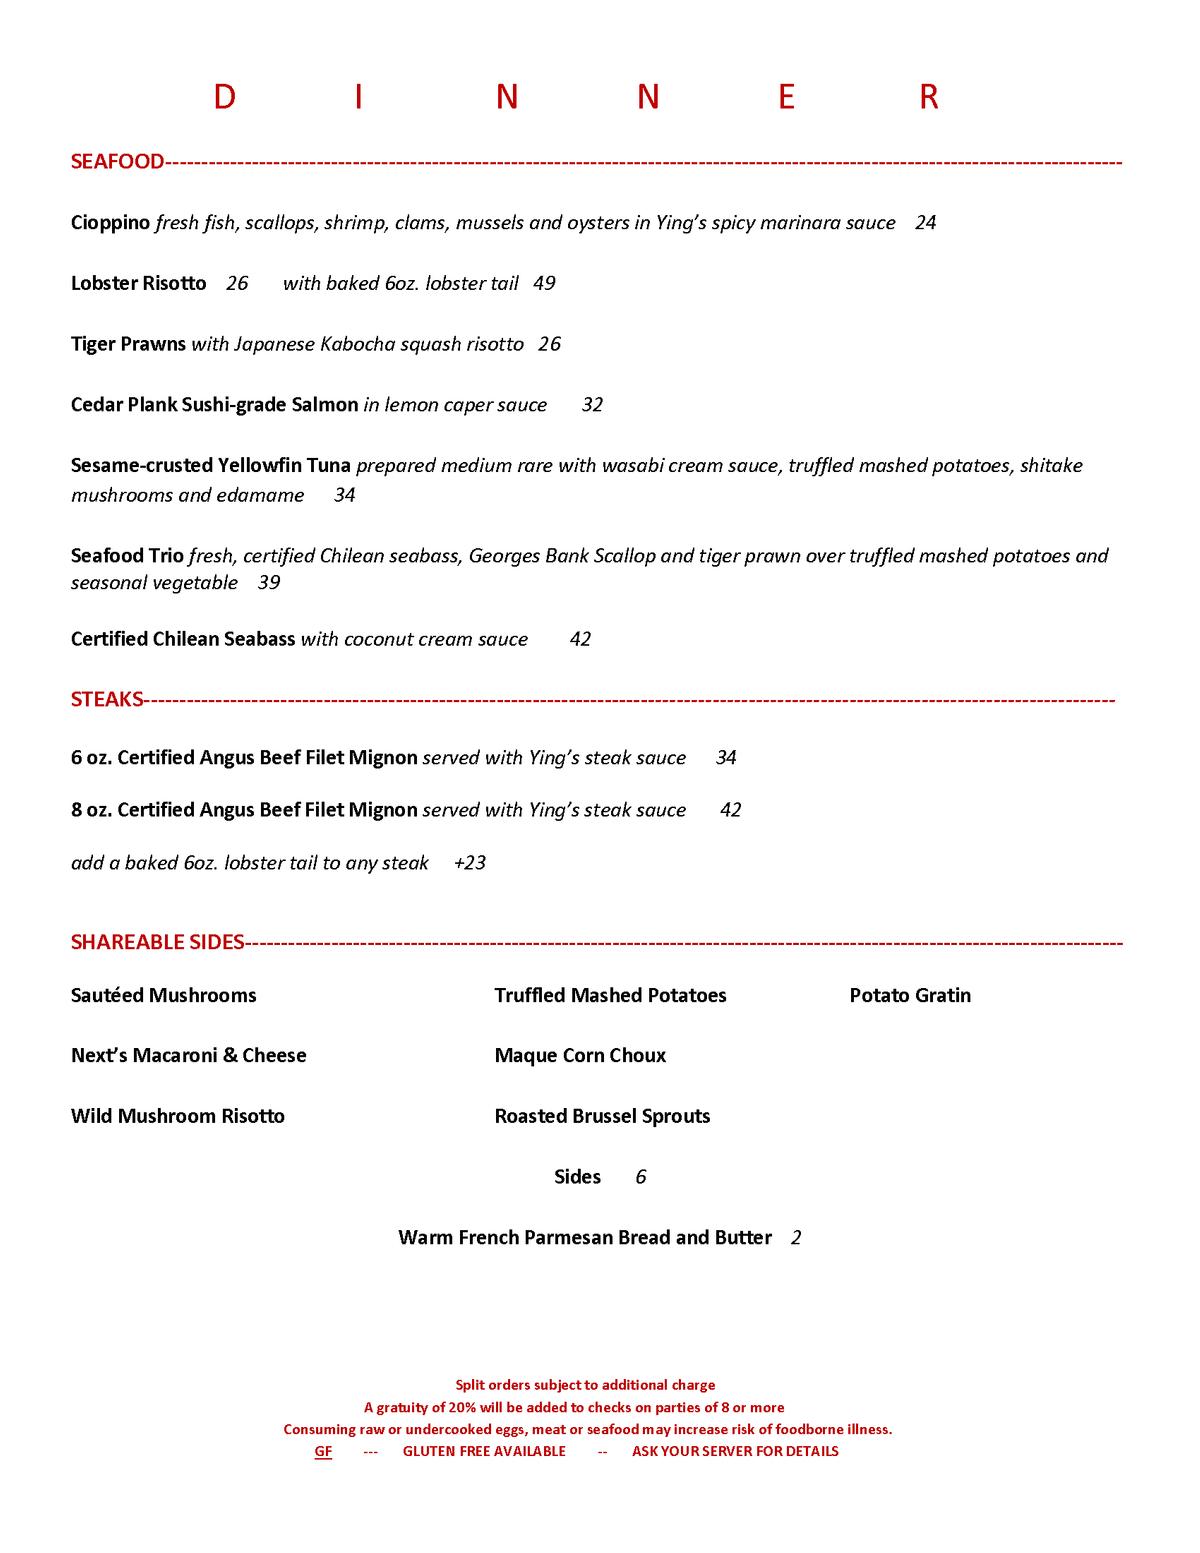 Dinner Menu October 16, 2019_Page_3.png